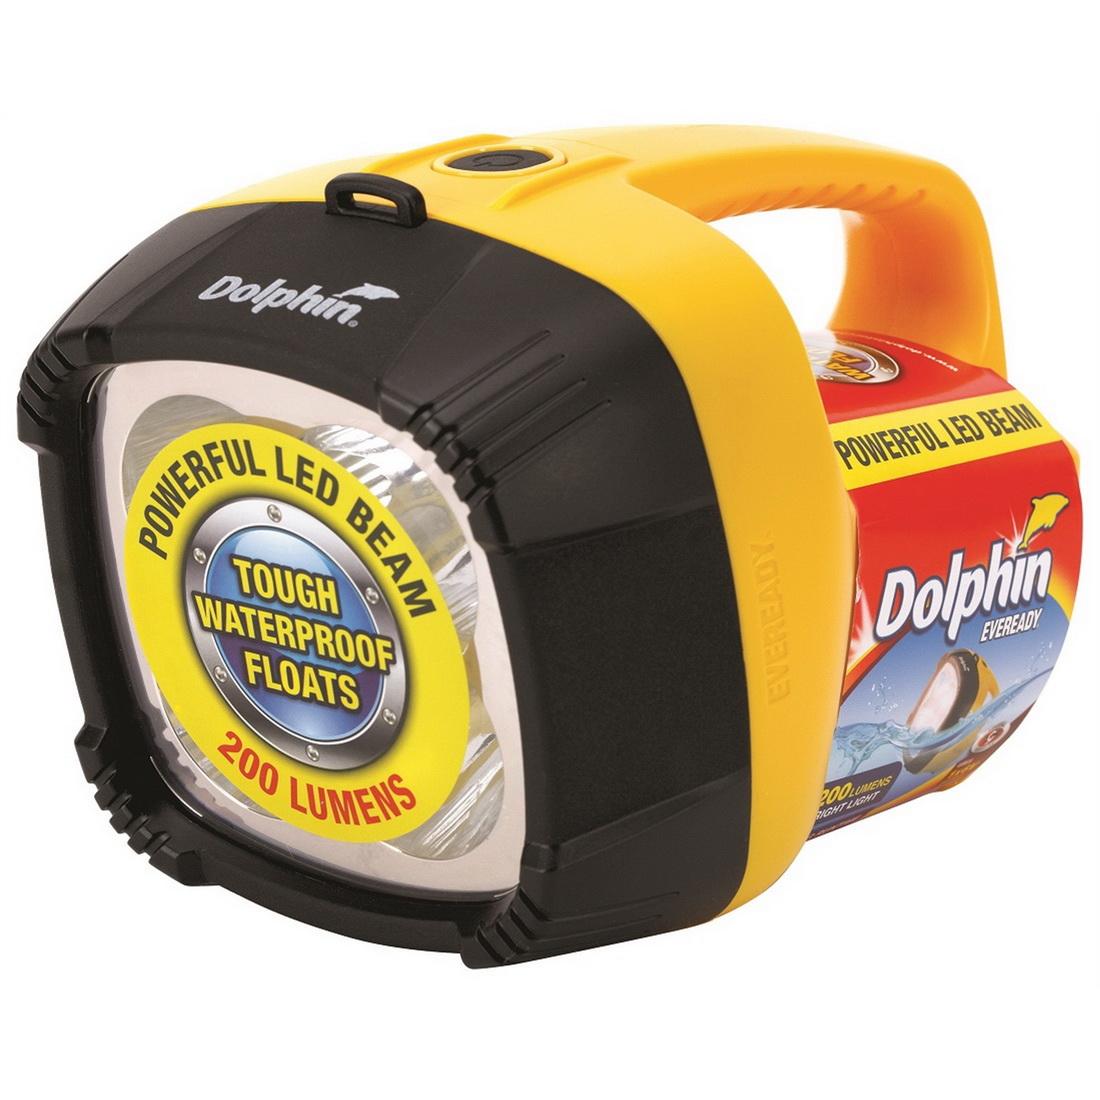 Dolphin 6V 200lm Led Lantern